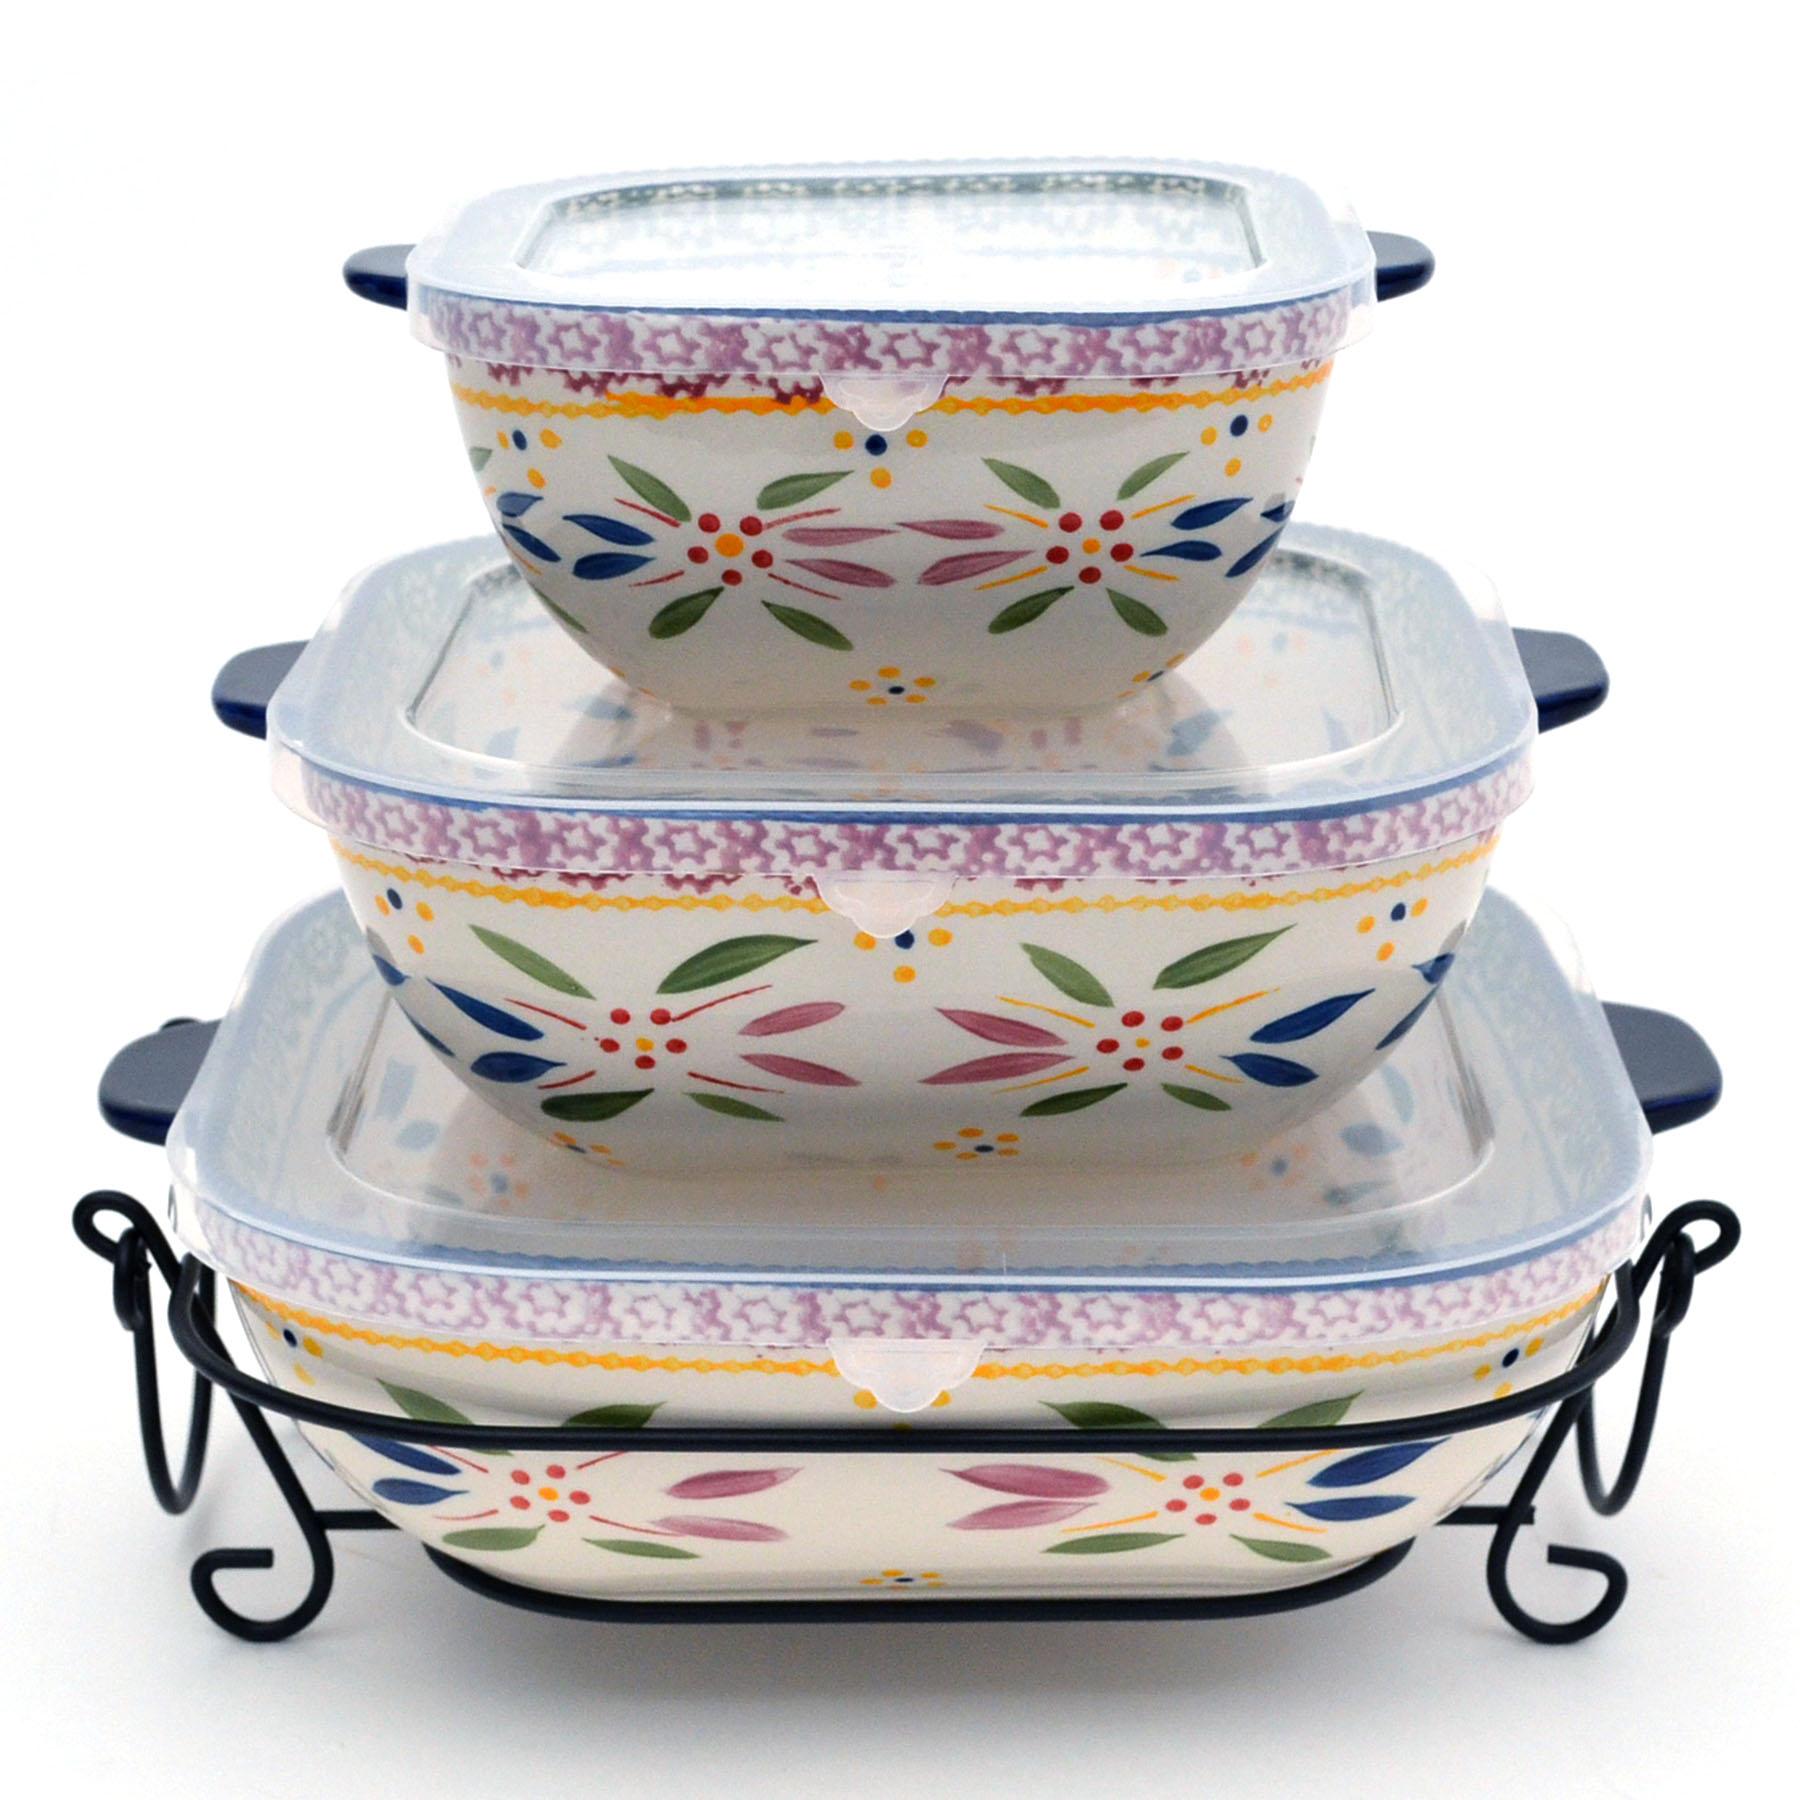 temp-tations® Old World Nested Square Bakerware Set – 3 Piece – Confetti